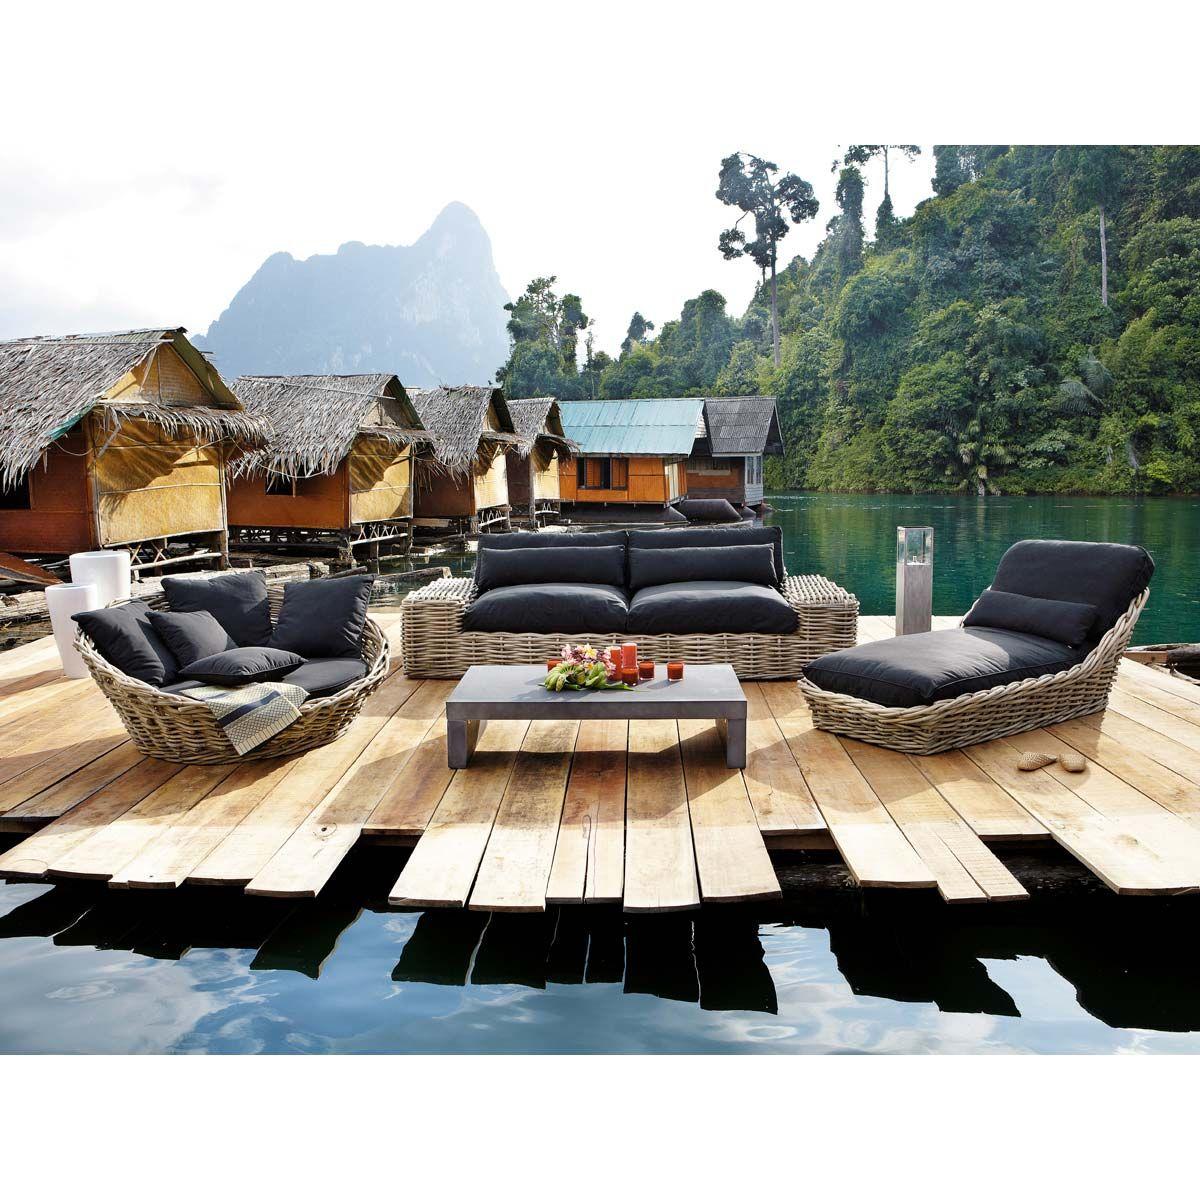 Outdoor Furniture In 2020   Outdoor Furniture Sets, Outdoor ... dedans Maison Du Monde Salon De Jardin